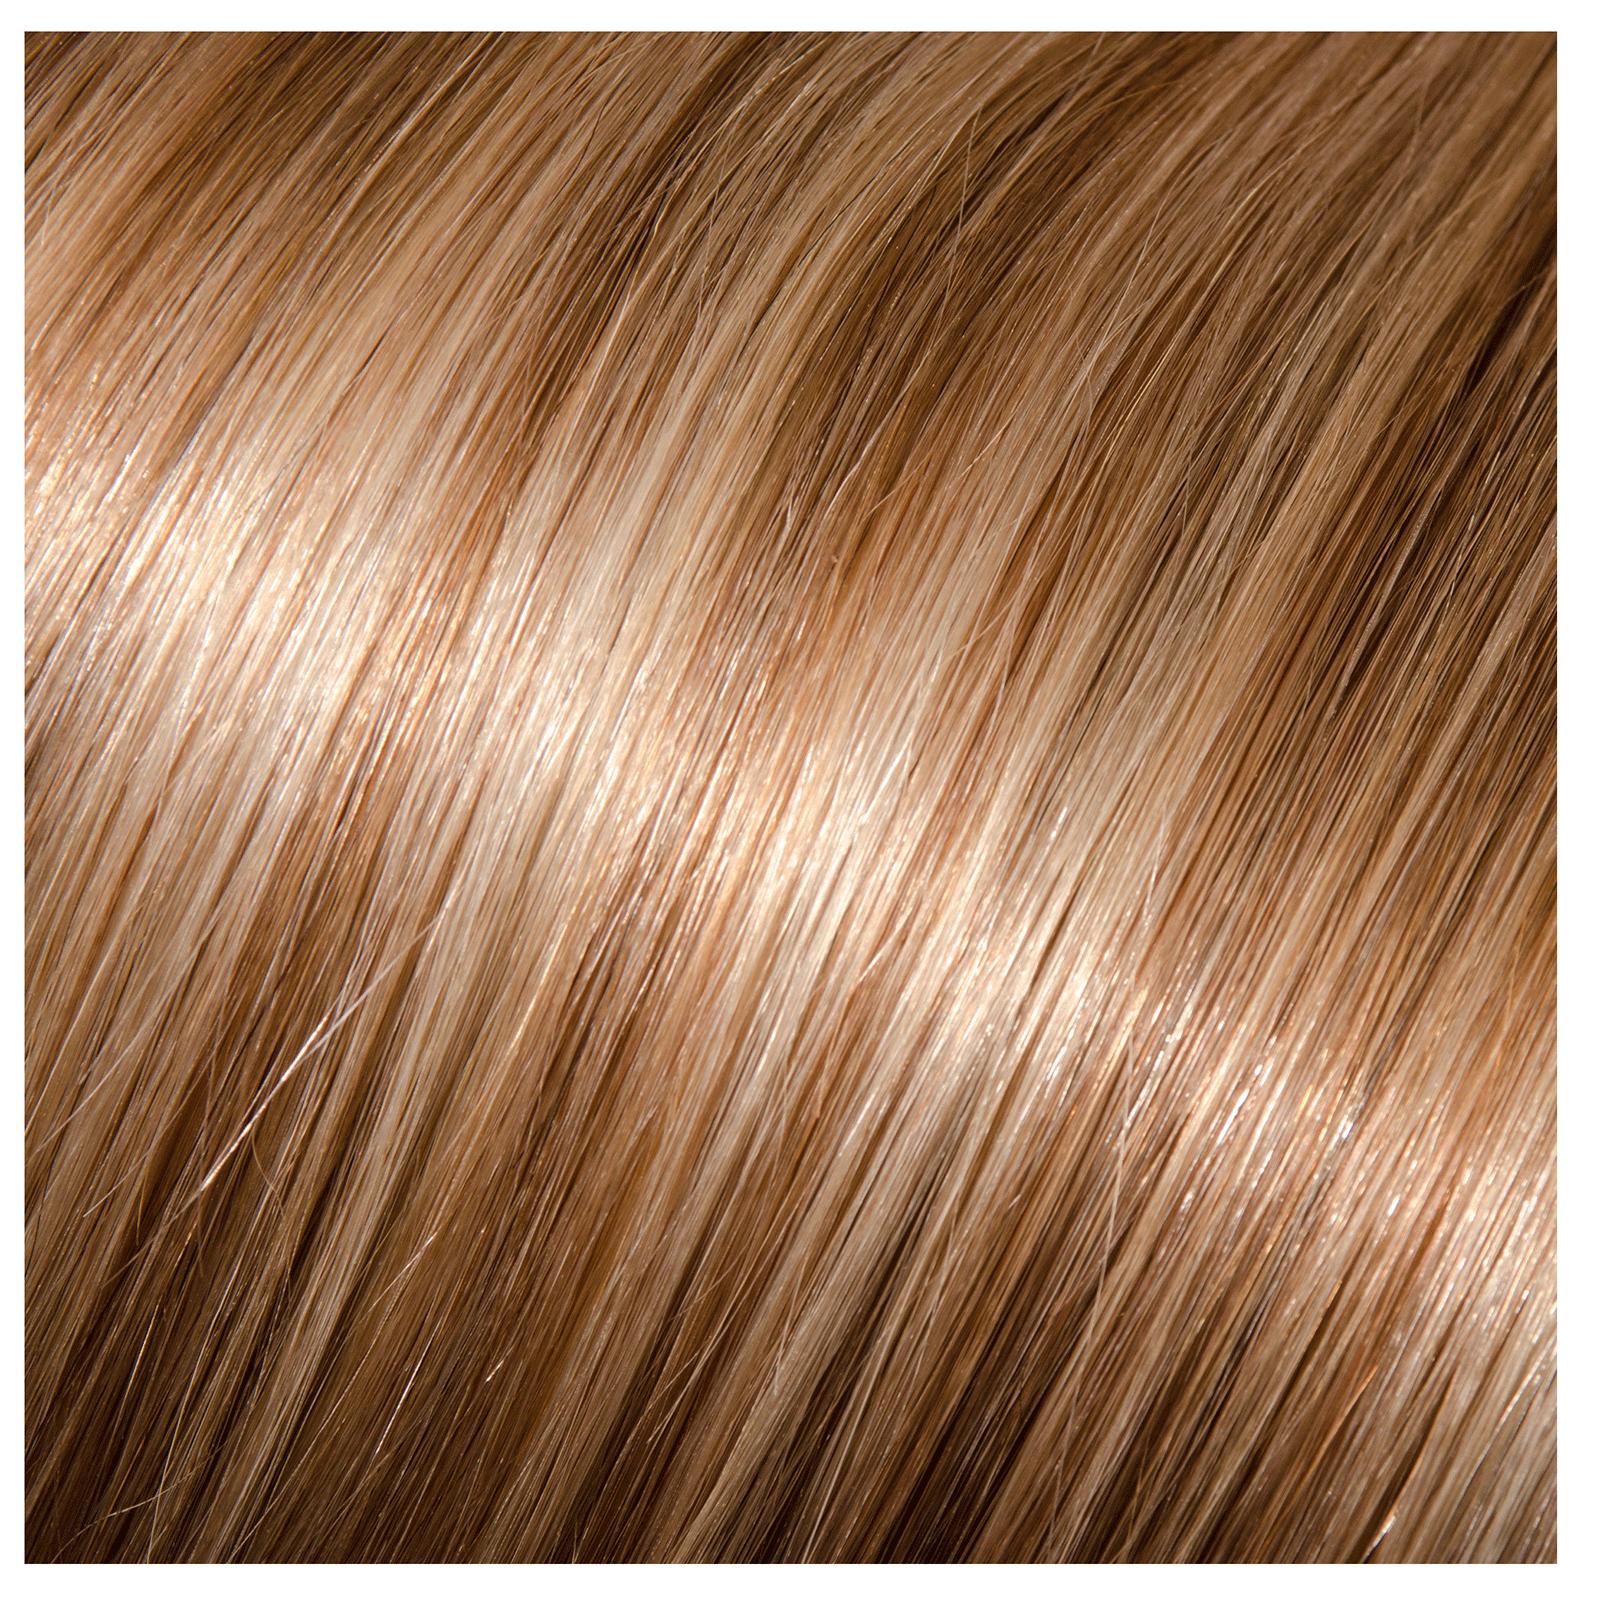 Doll Bangs 12600 Caroline Babe Hair Extensions Cosmoprof